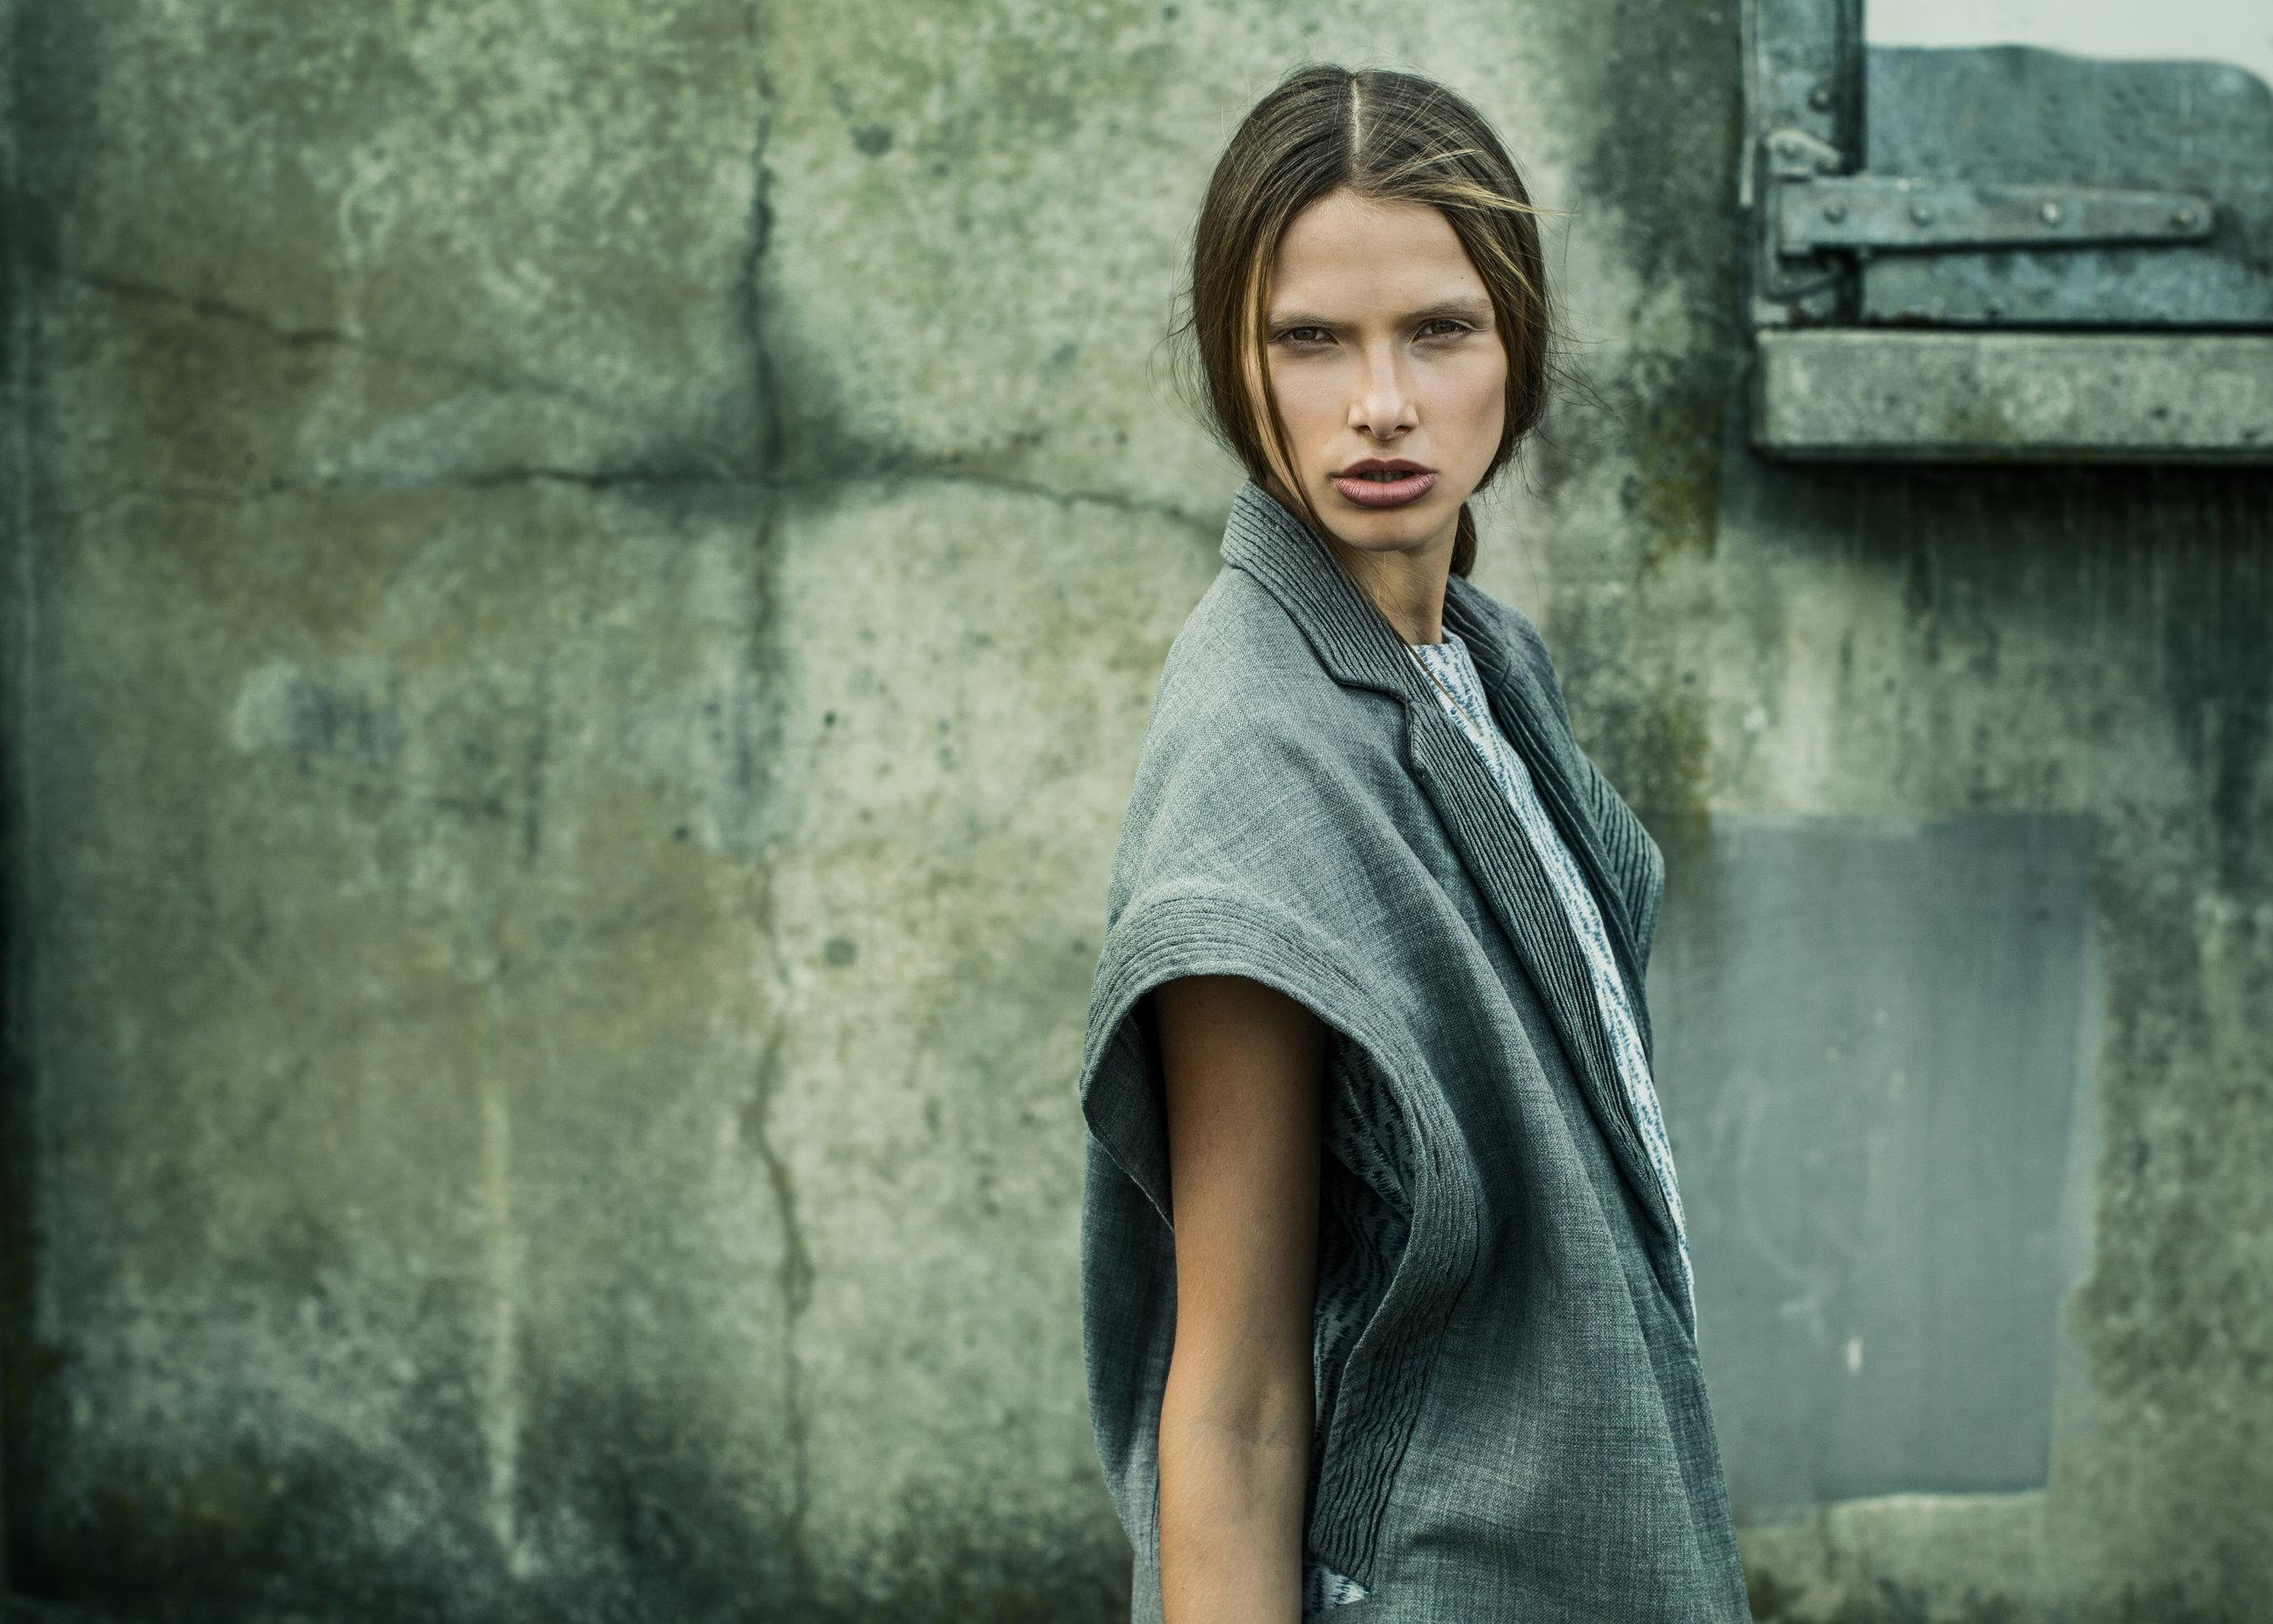 Vest by Gwen Shih-Yao Lai, MFA Fashion Design. Tunic by Jason Tam, MFA Fashion Design.